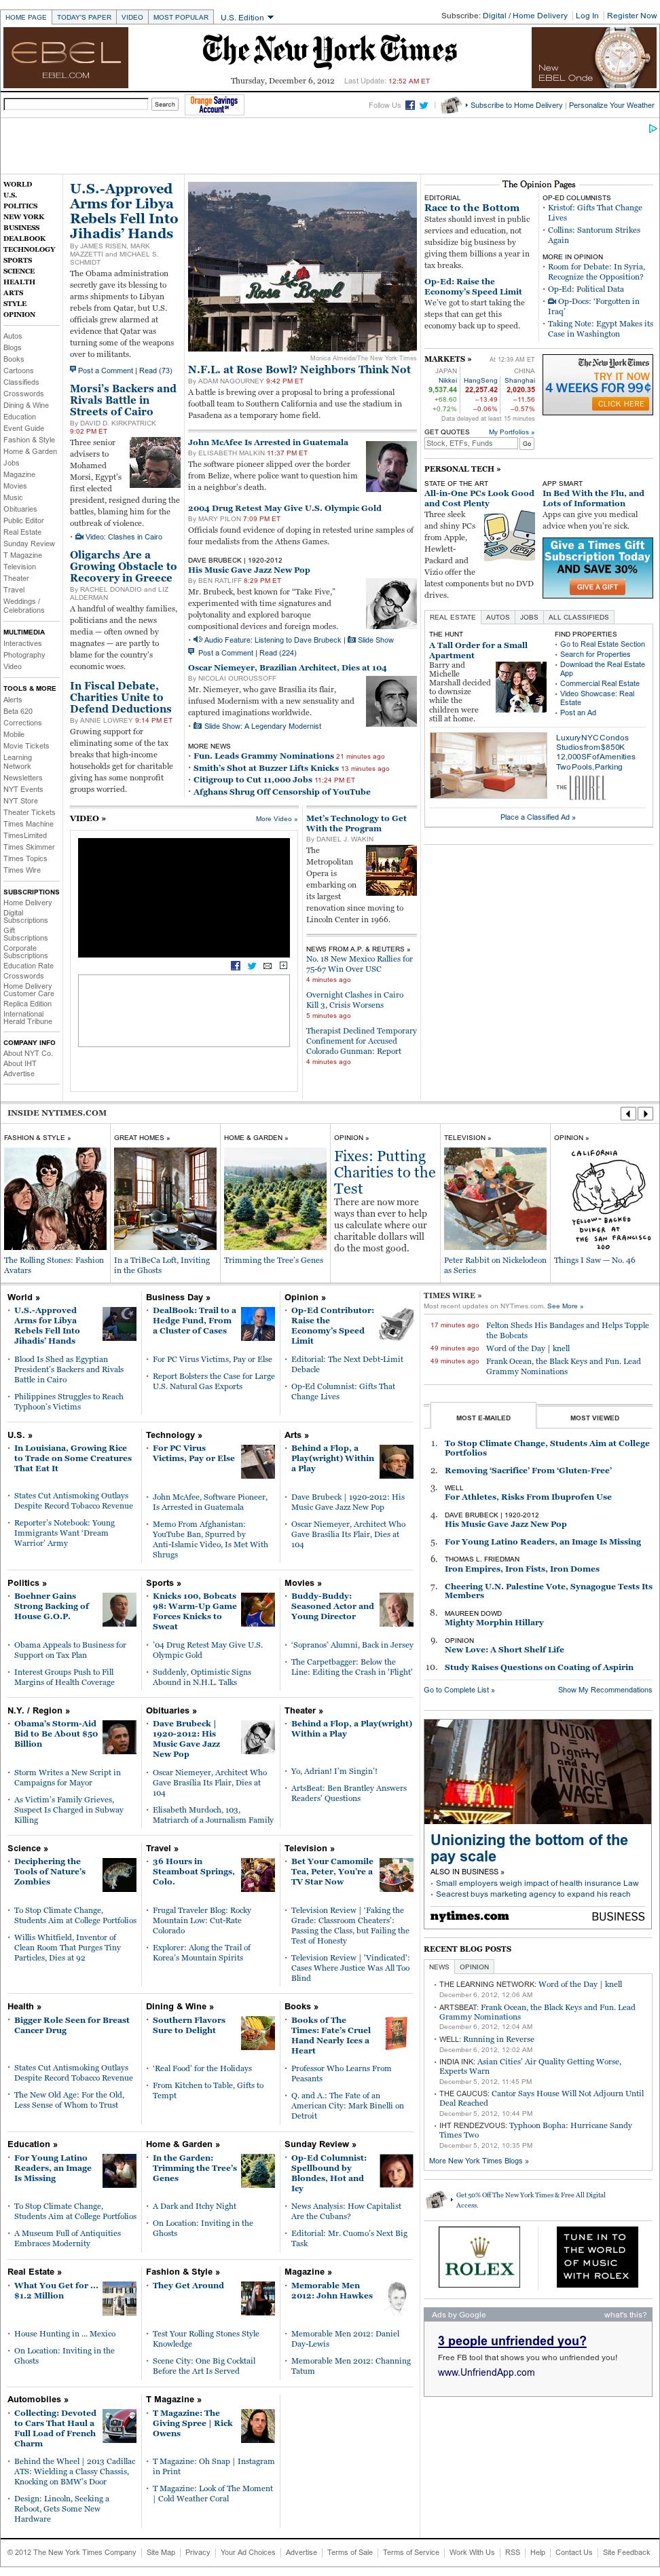 The New York Times at Thursday Dec. 6, 2012, 6:01 a.m. UTC